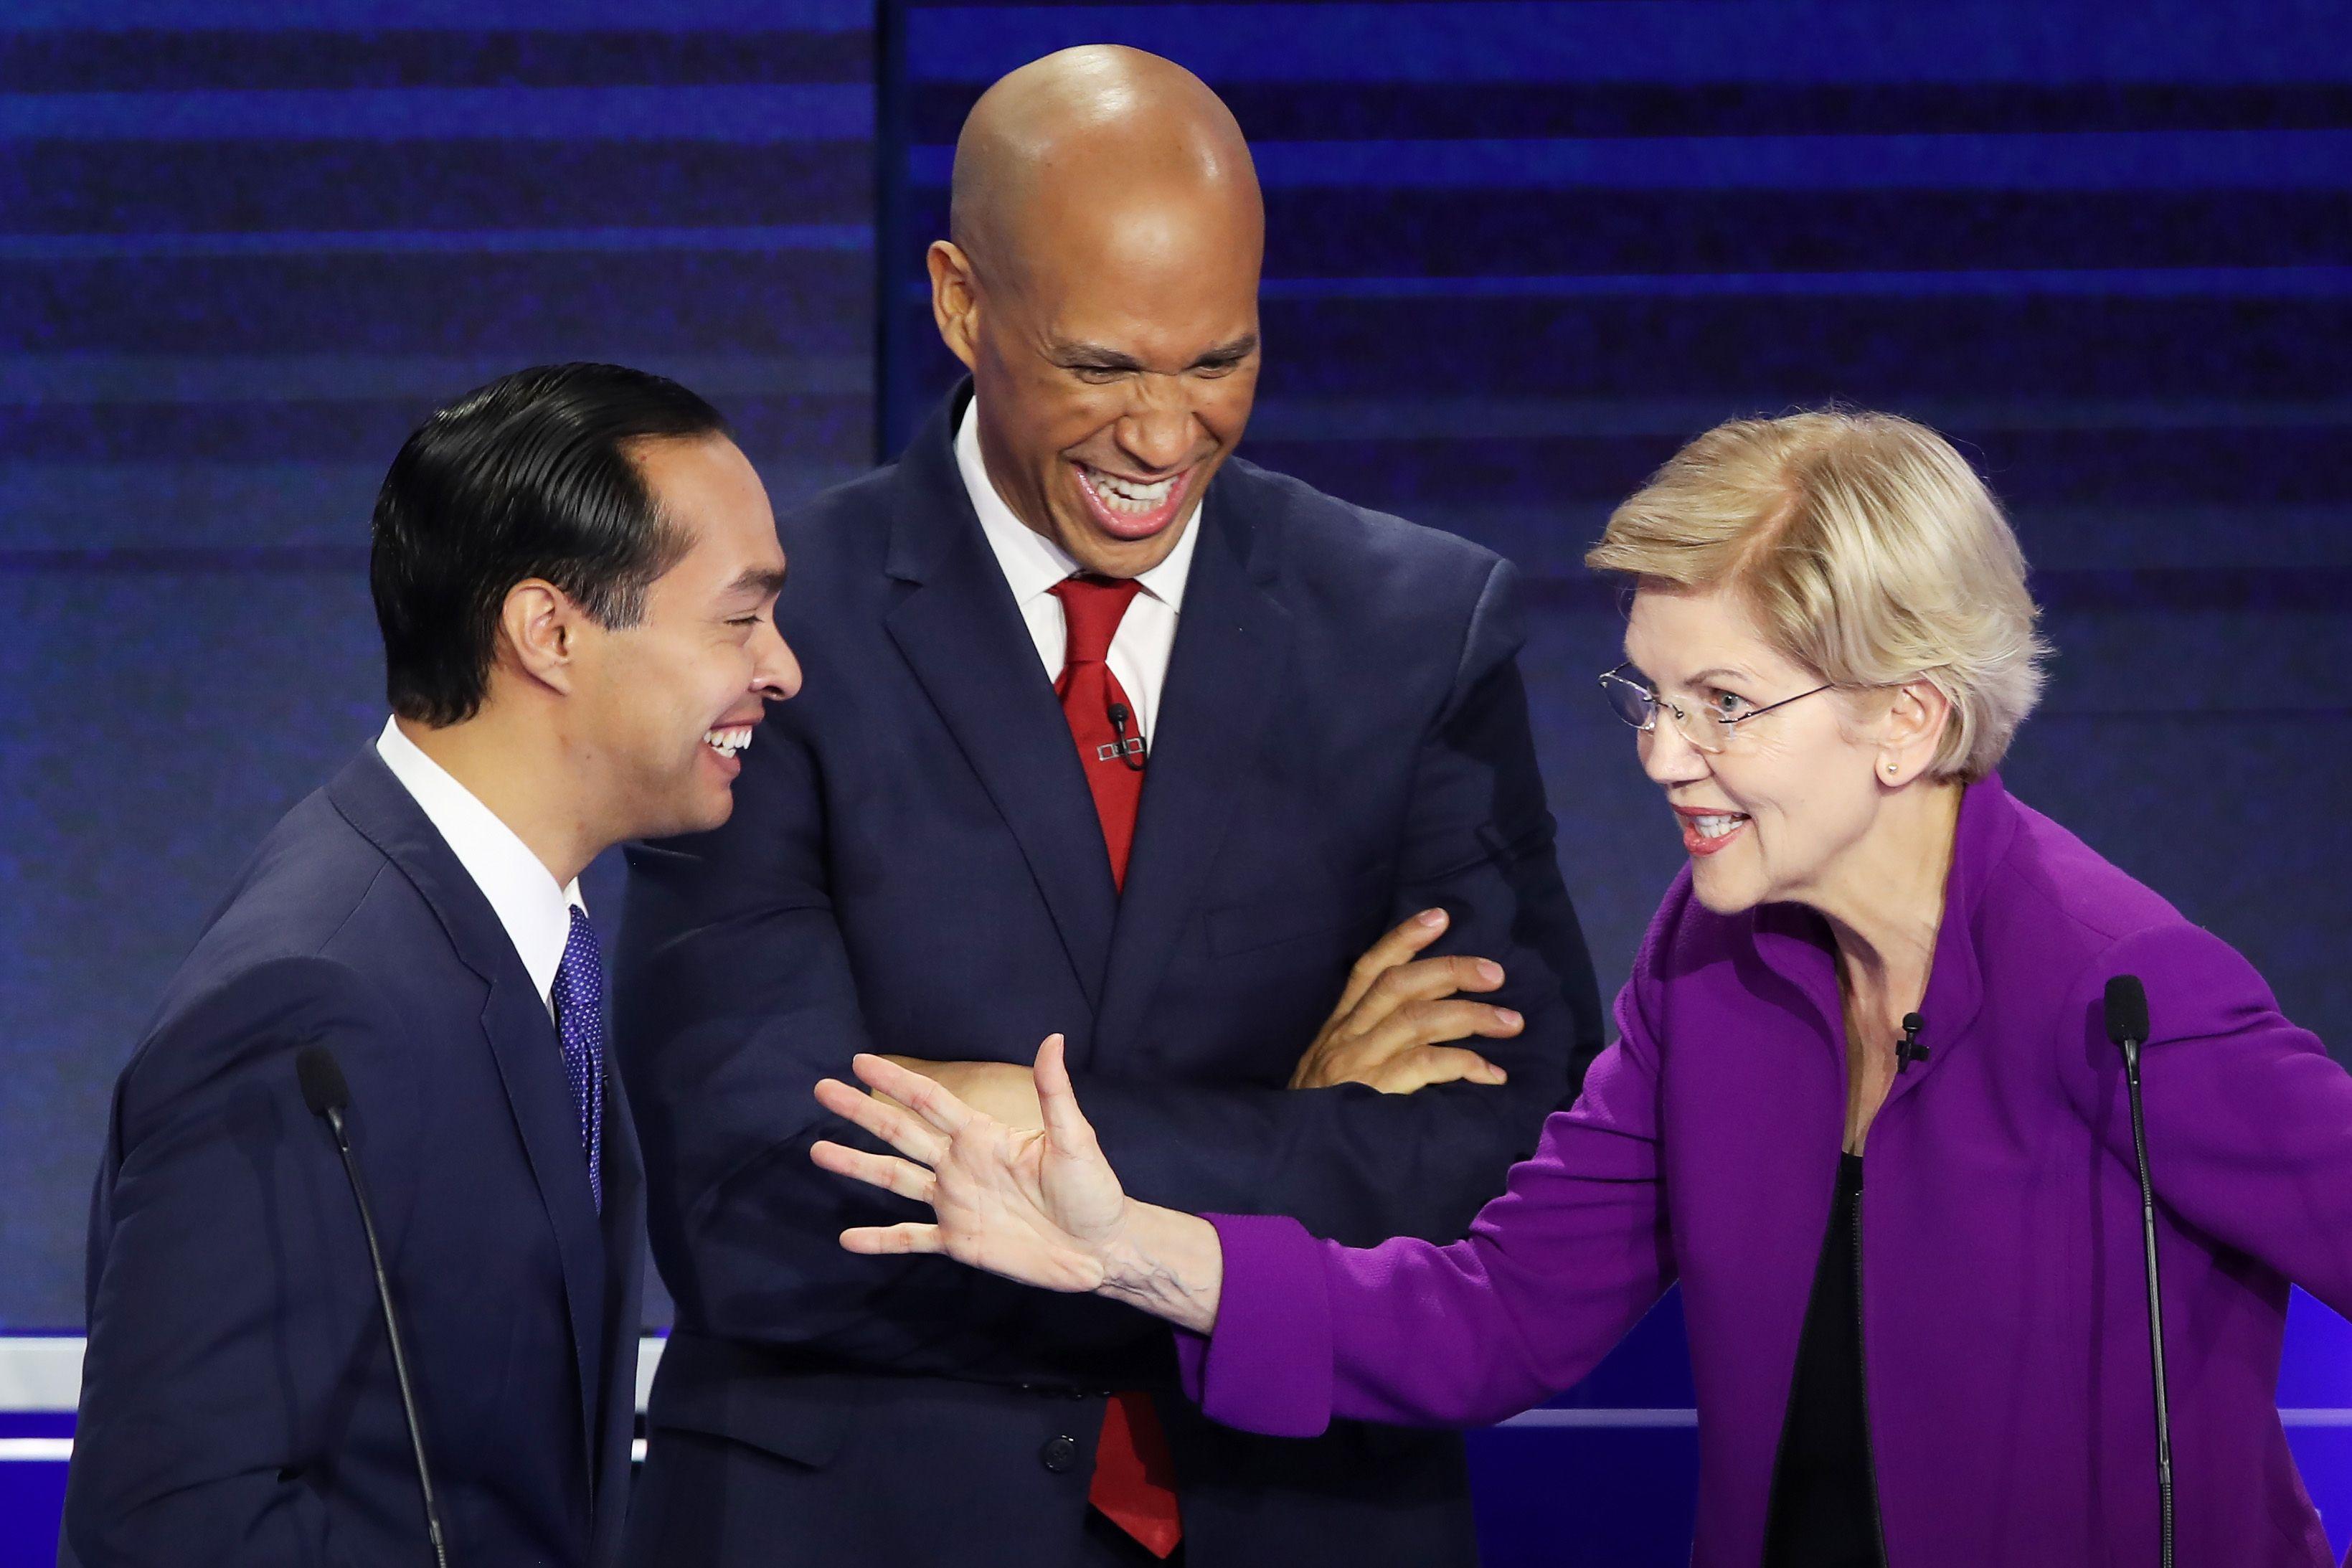 Best Giveaways 2020 Best Tweets From the First 2020 Democratic Presidential Debate